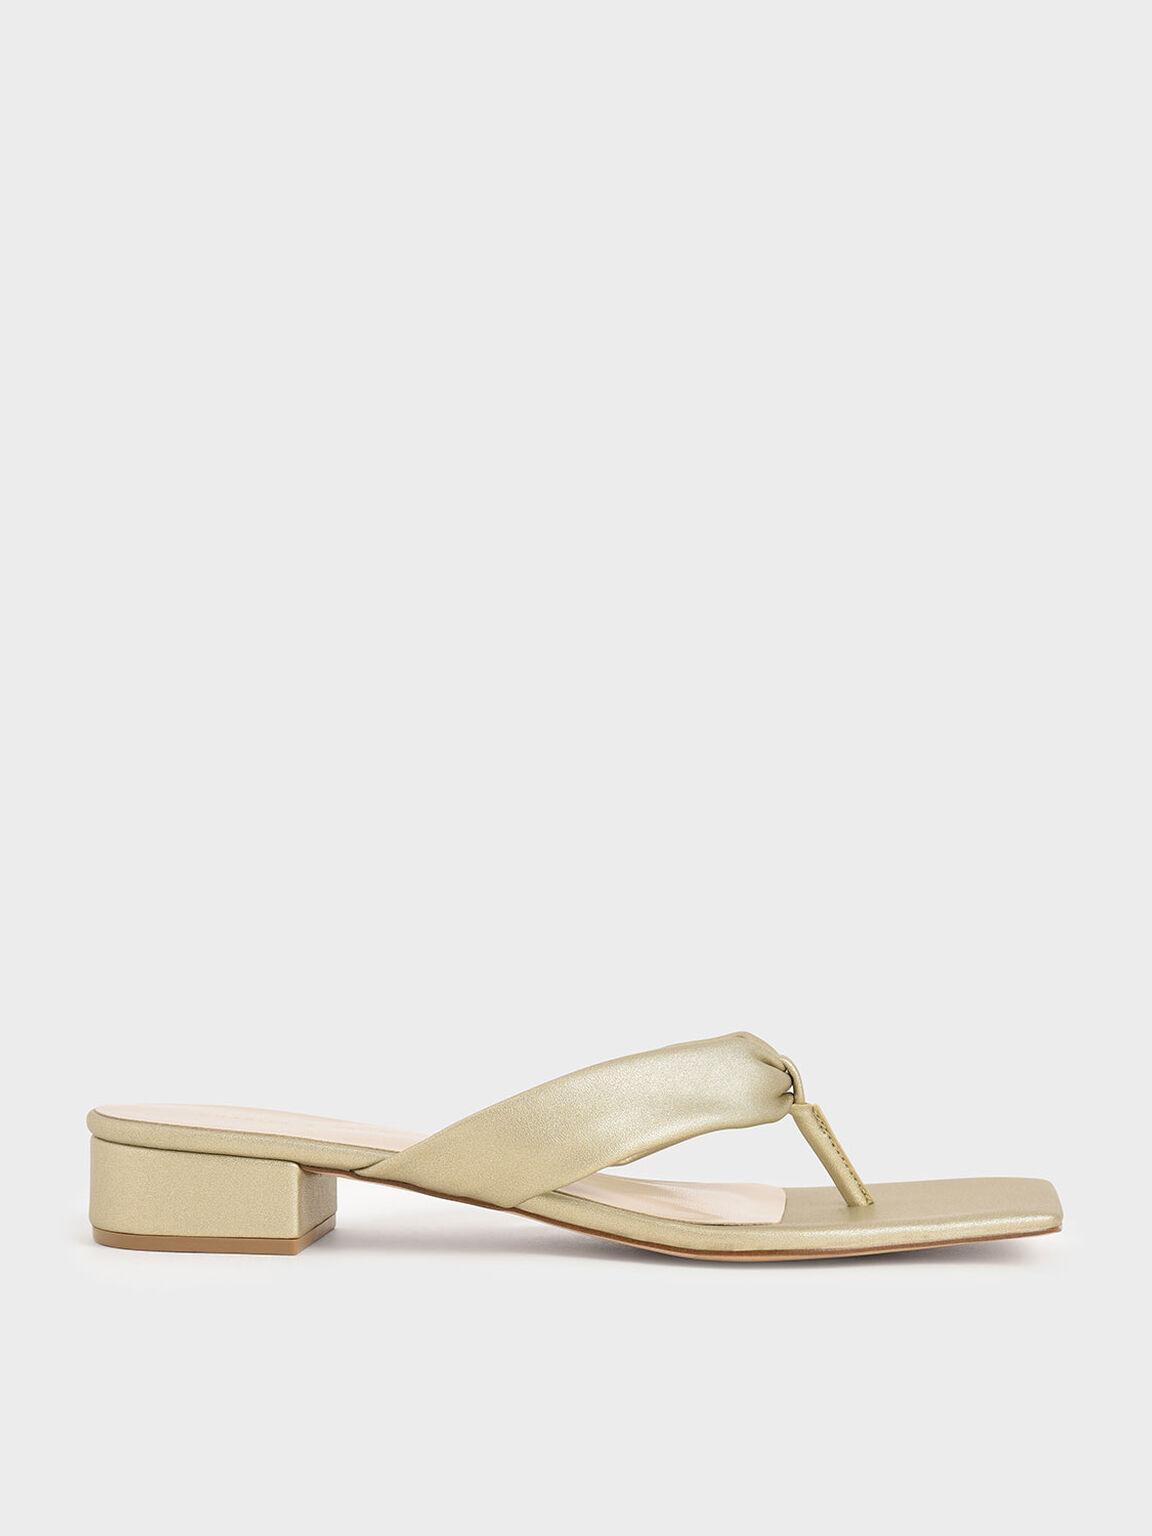 Metallic Puffy Strap Thong Sandals, Gold, hi-res